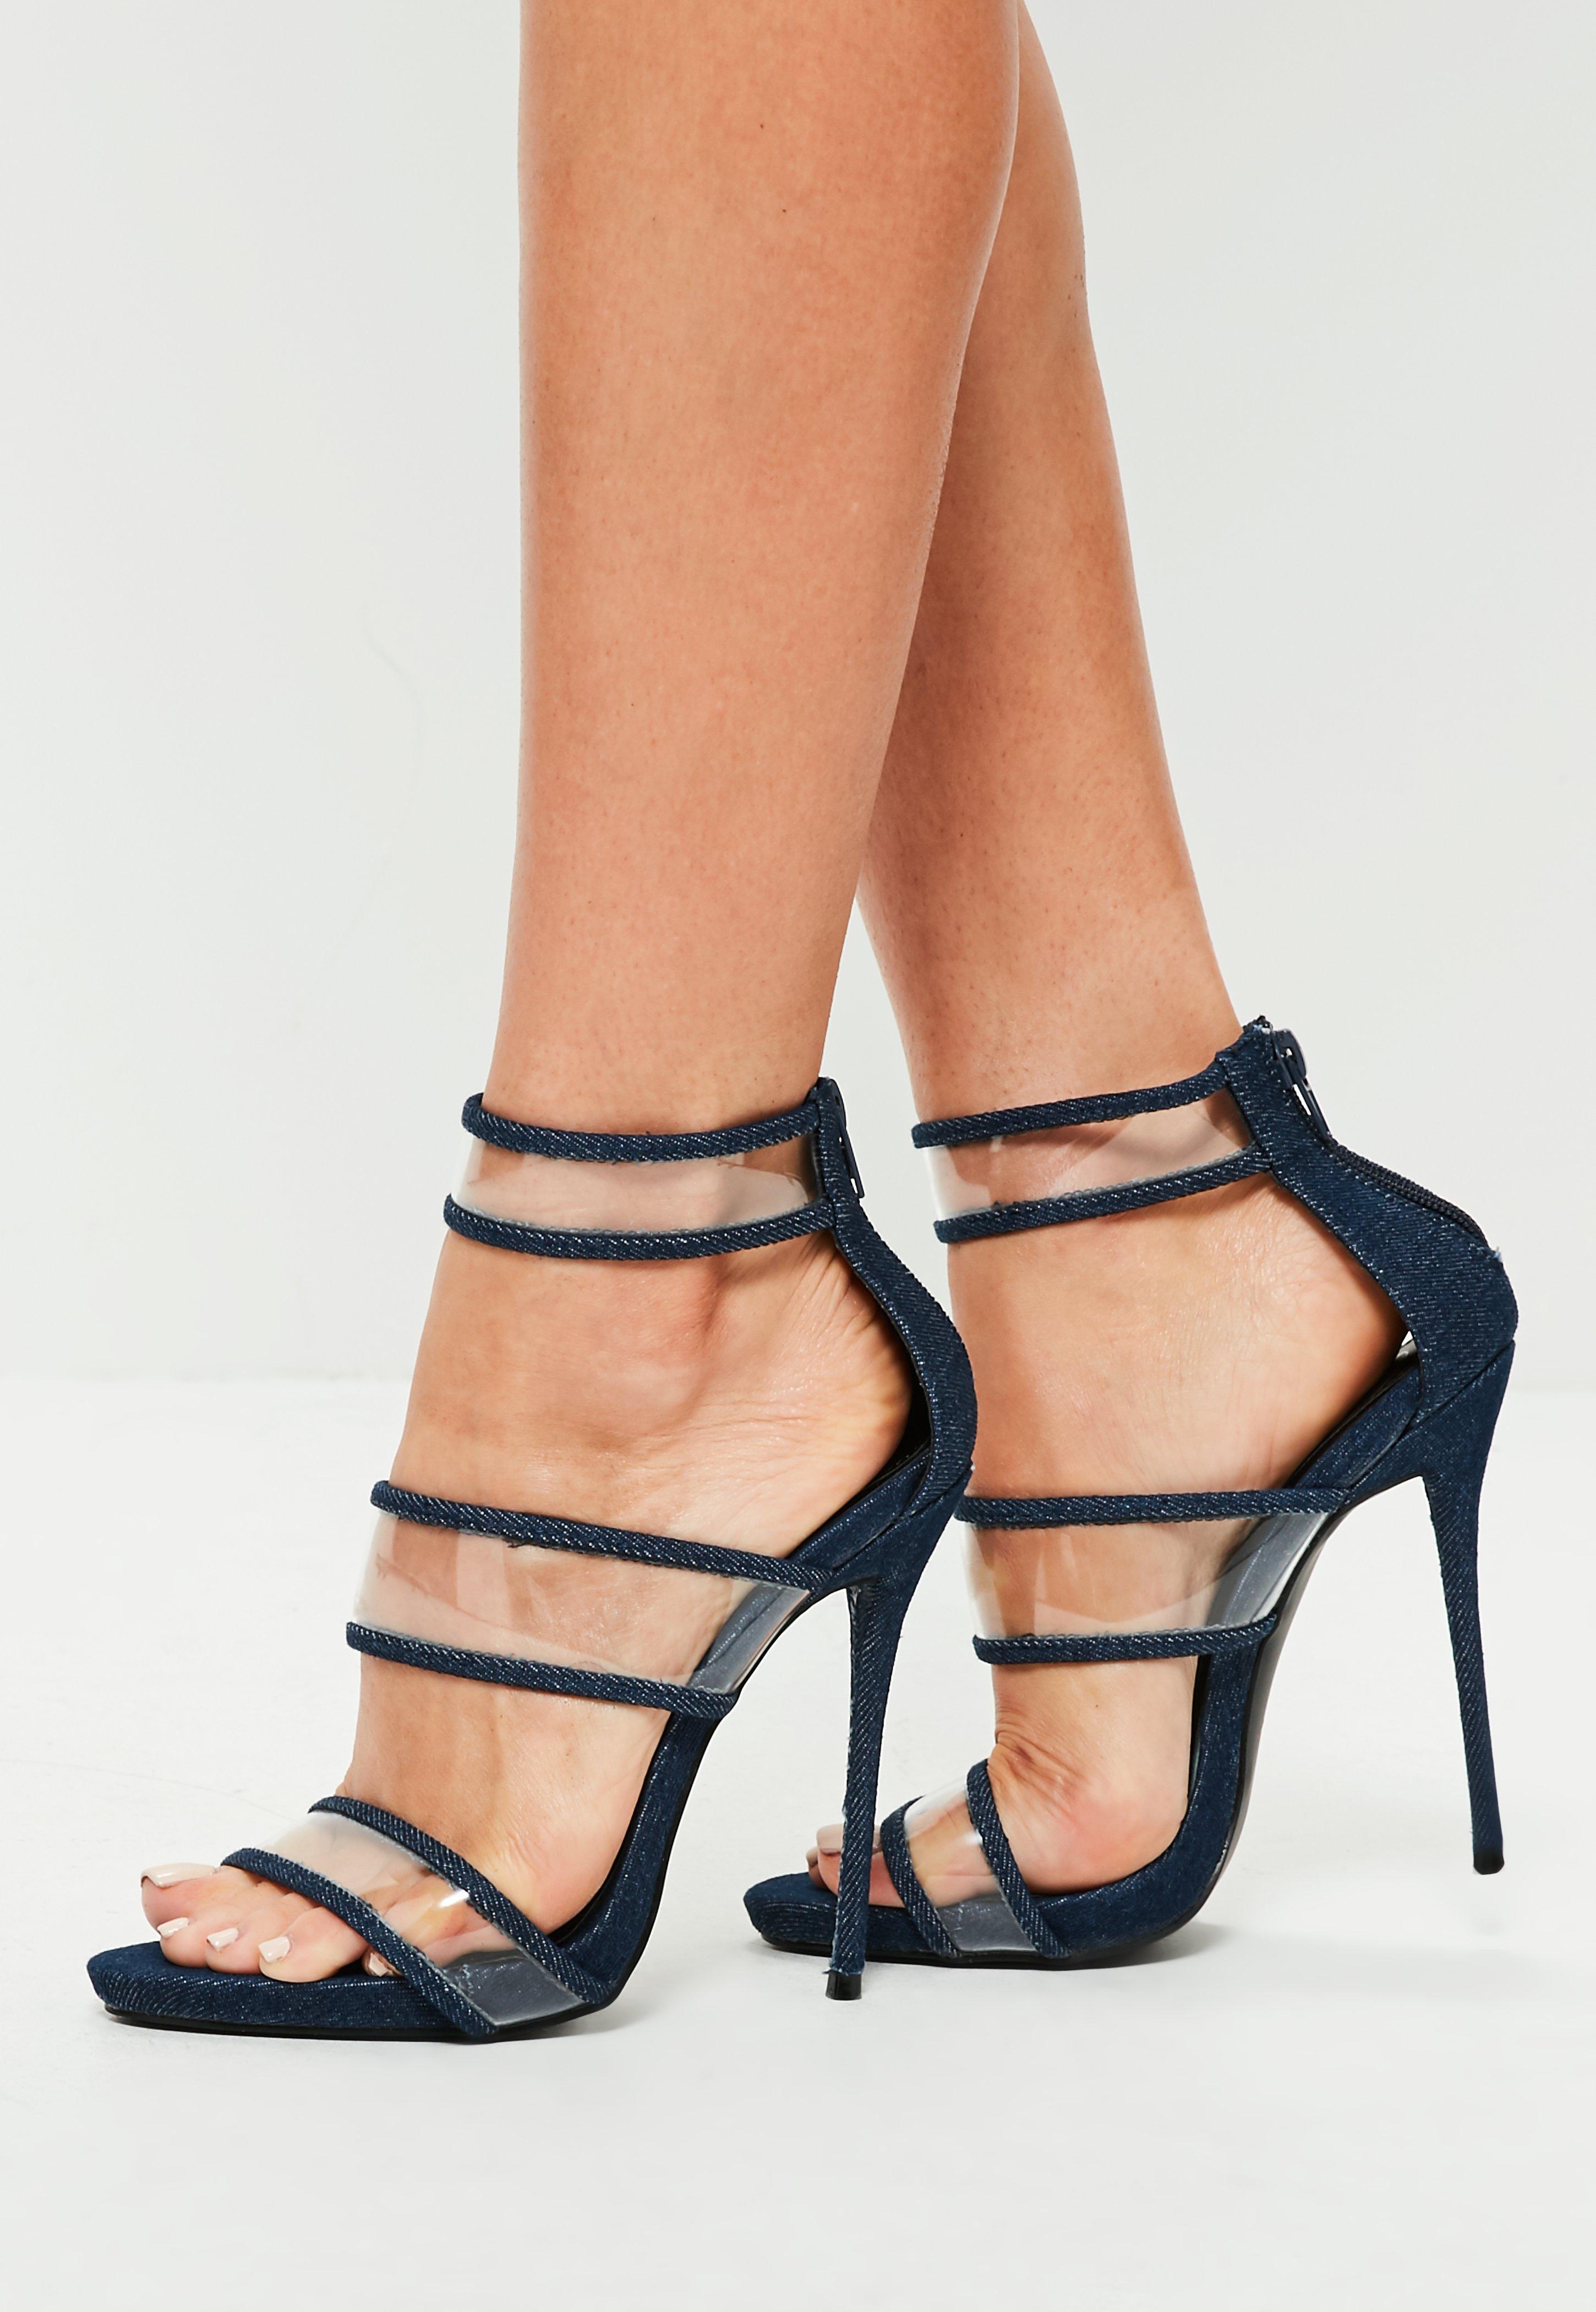 53fbca9922c9 Missguided Blue Denim Strappy Clear High Heel Sandals in Blue - Lyst